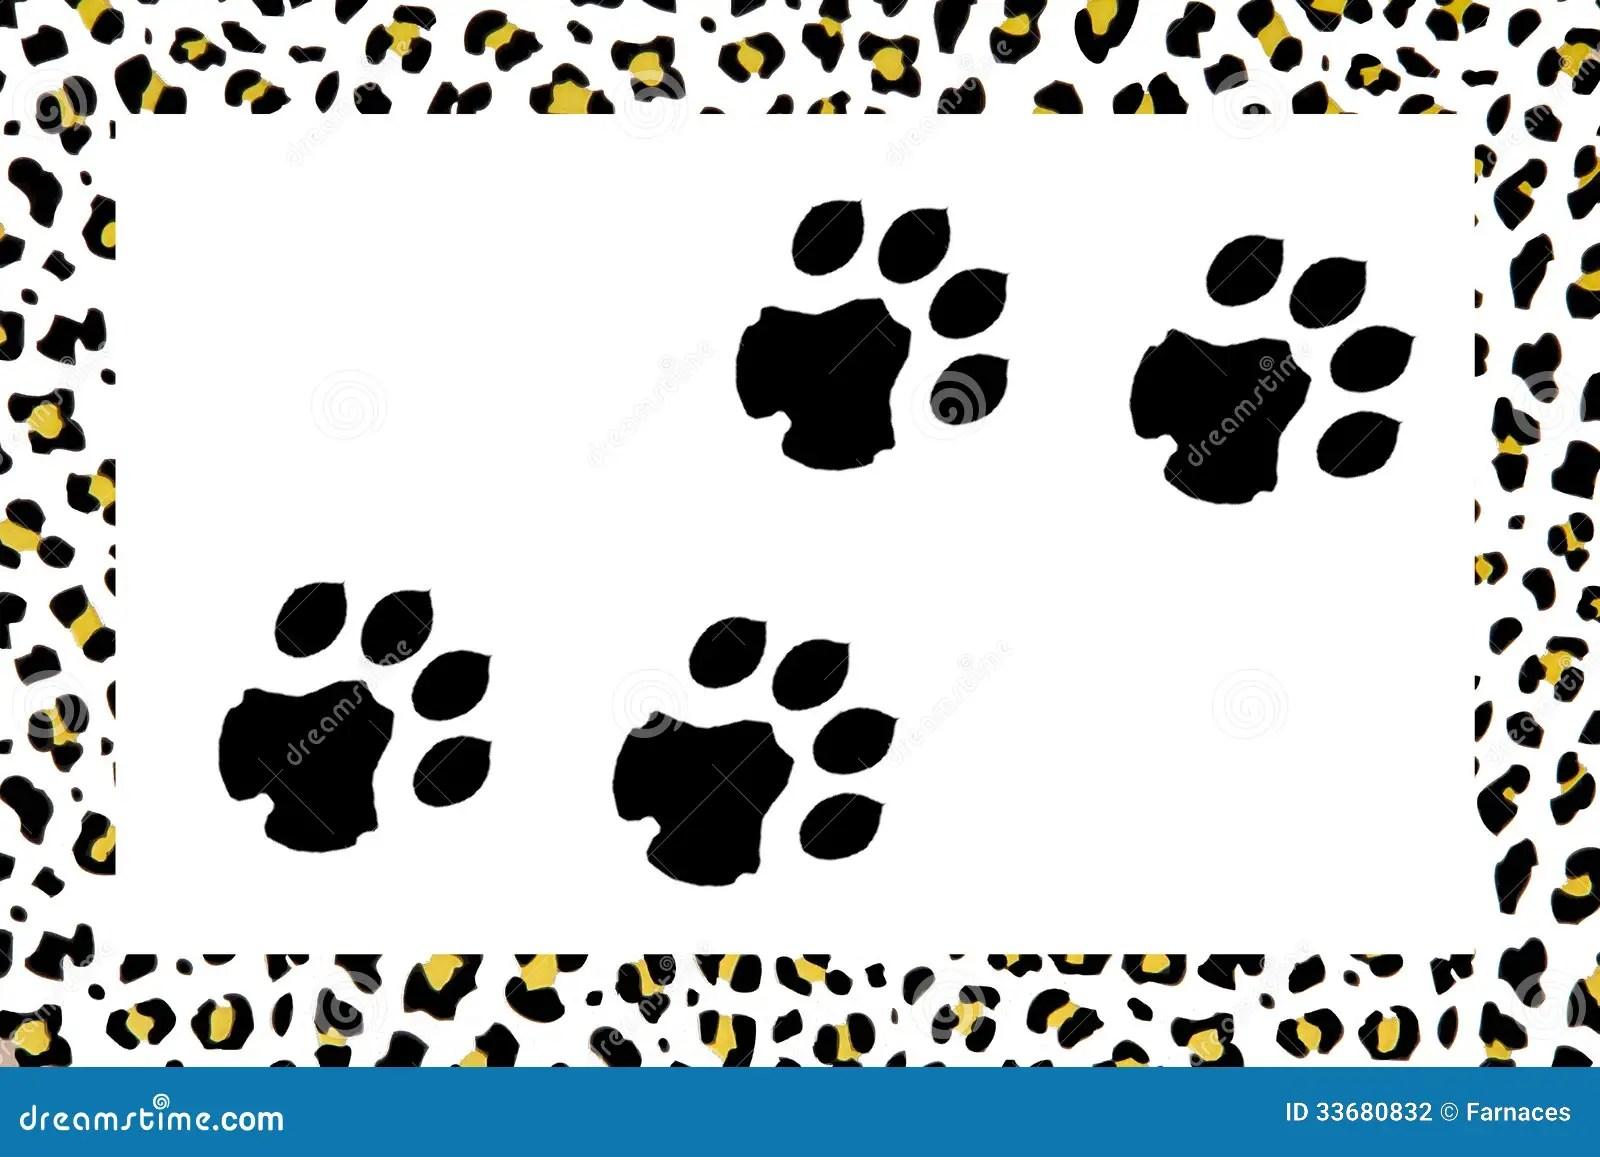 Black Animal Print Wallpaper Leopard Footprints Stock Illustration Illustration Of